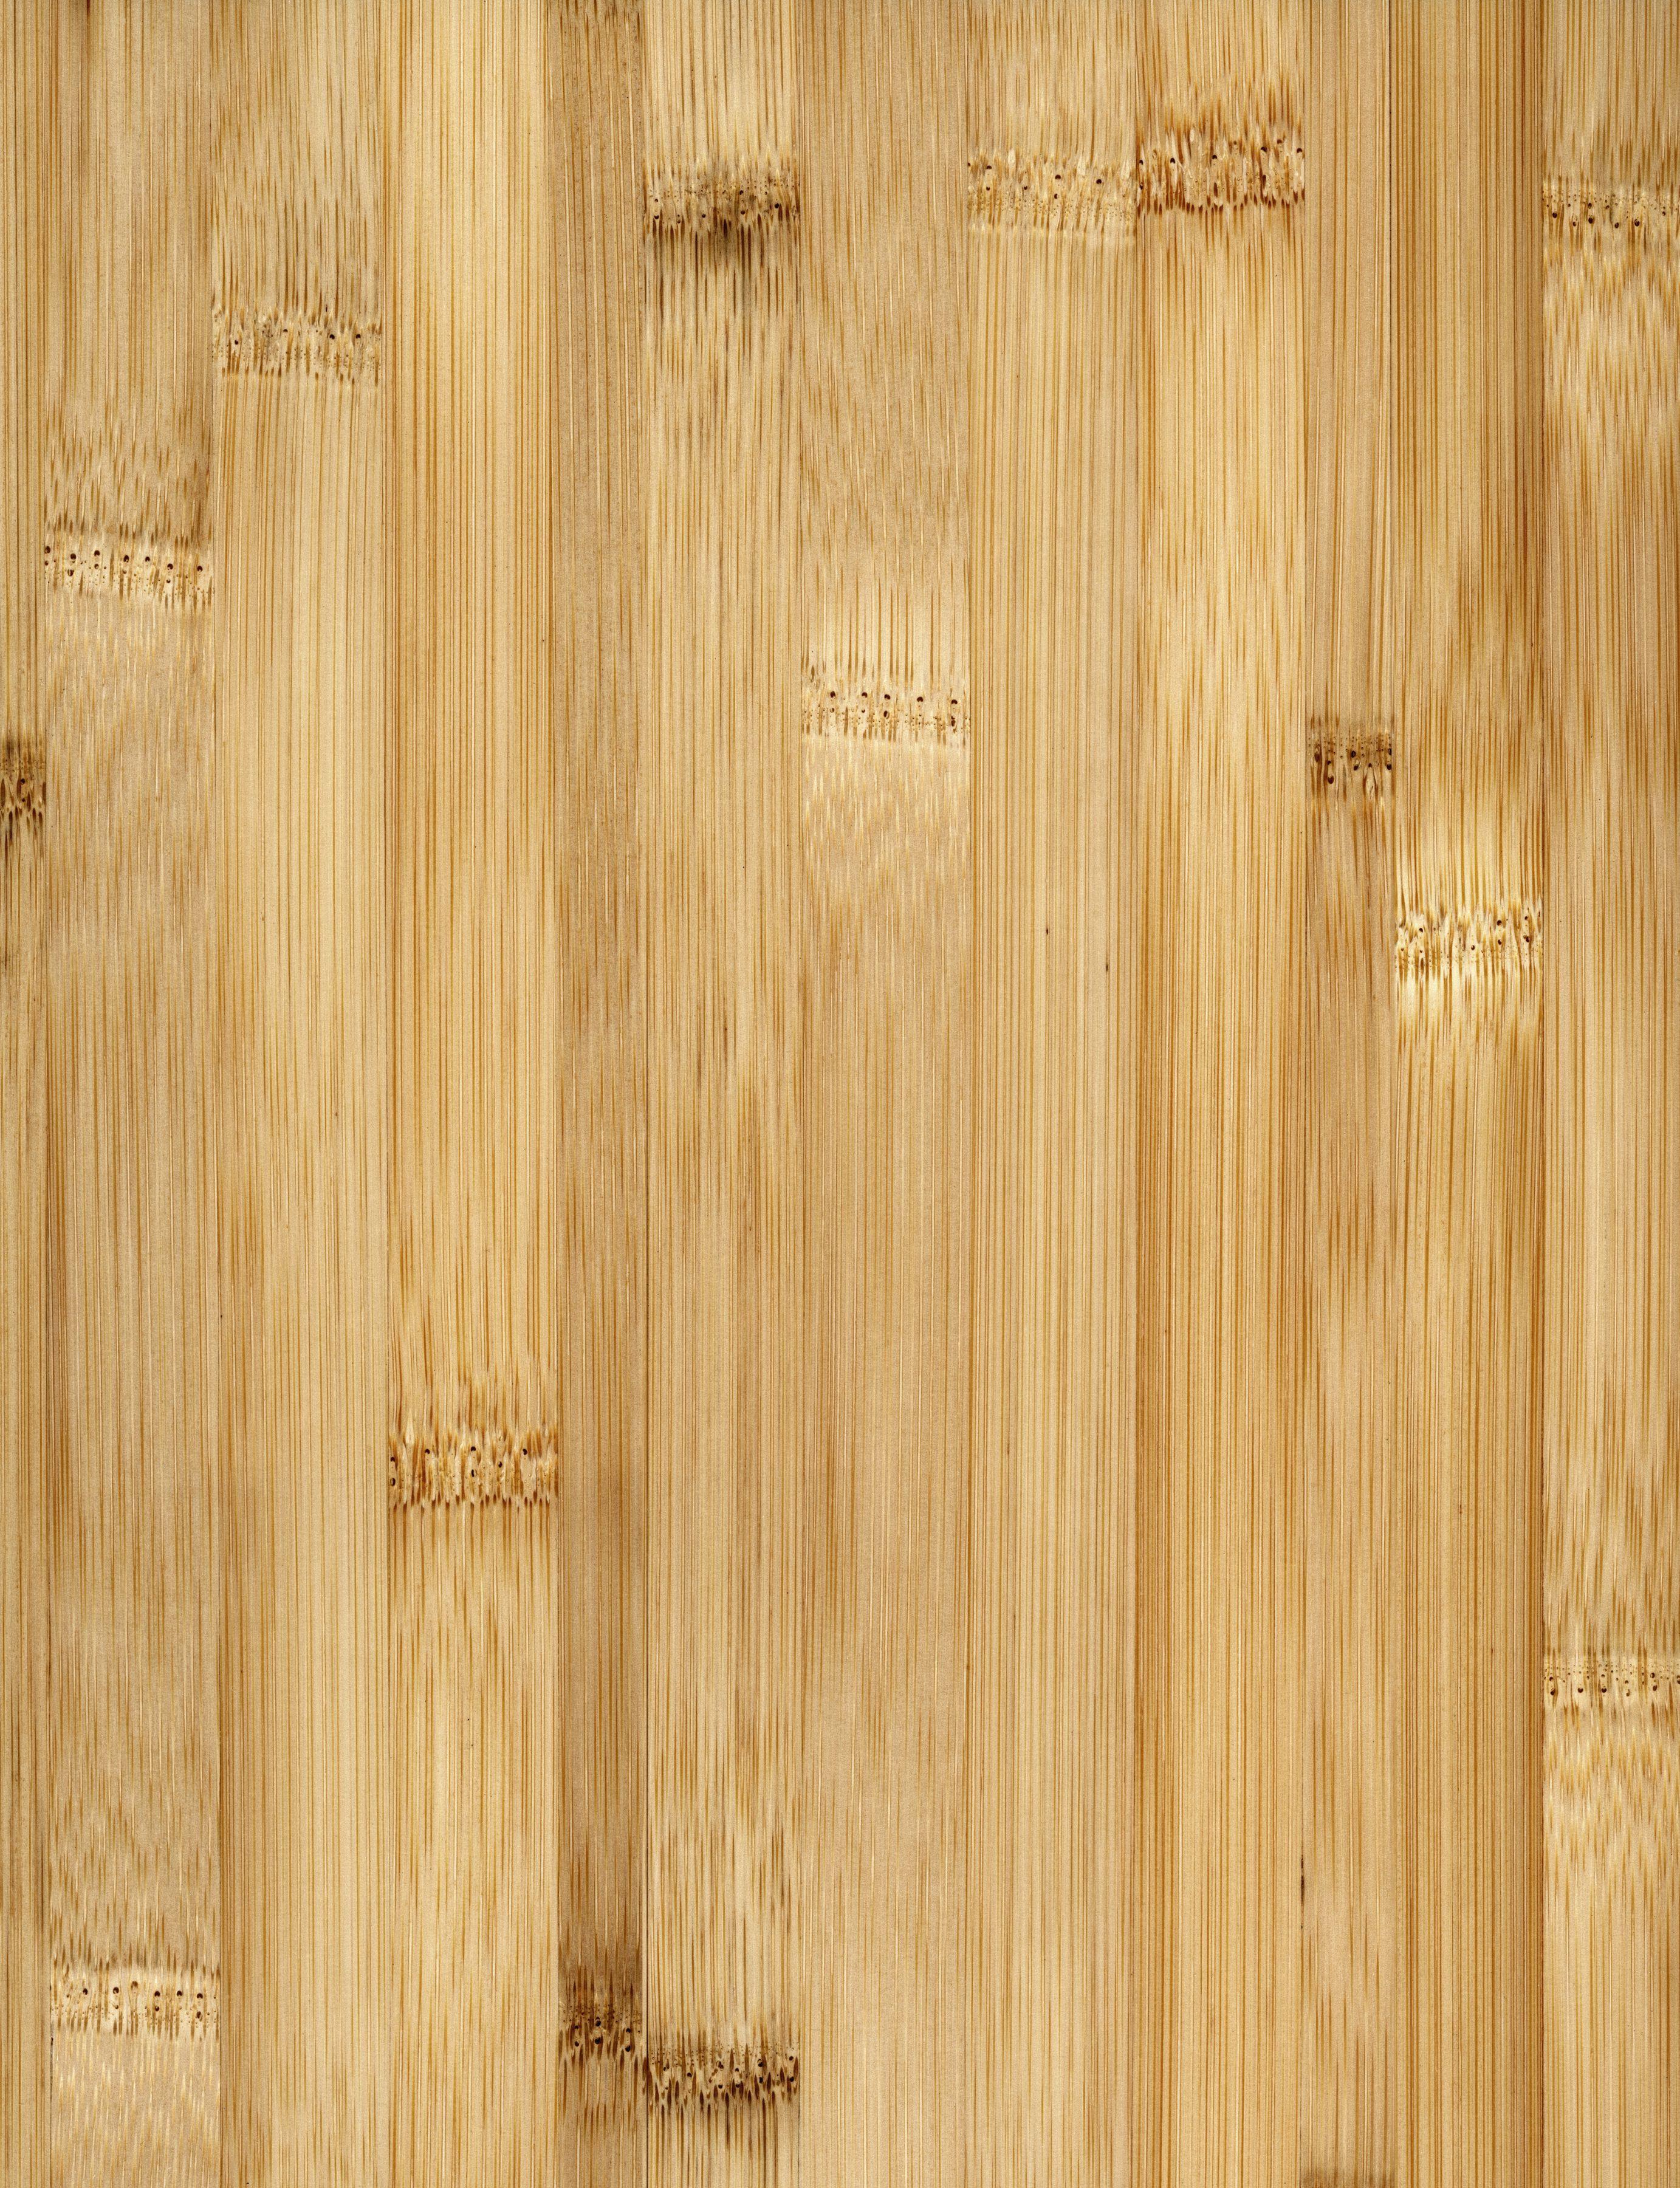 walnut hardwood flooring durability of bamboo flooring the basics within bamboo floor full frame 200266305 001 588805c03df78c2ccdd4c706